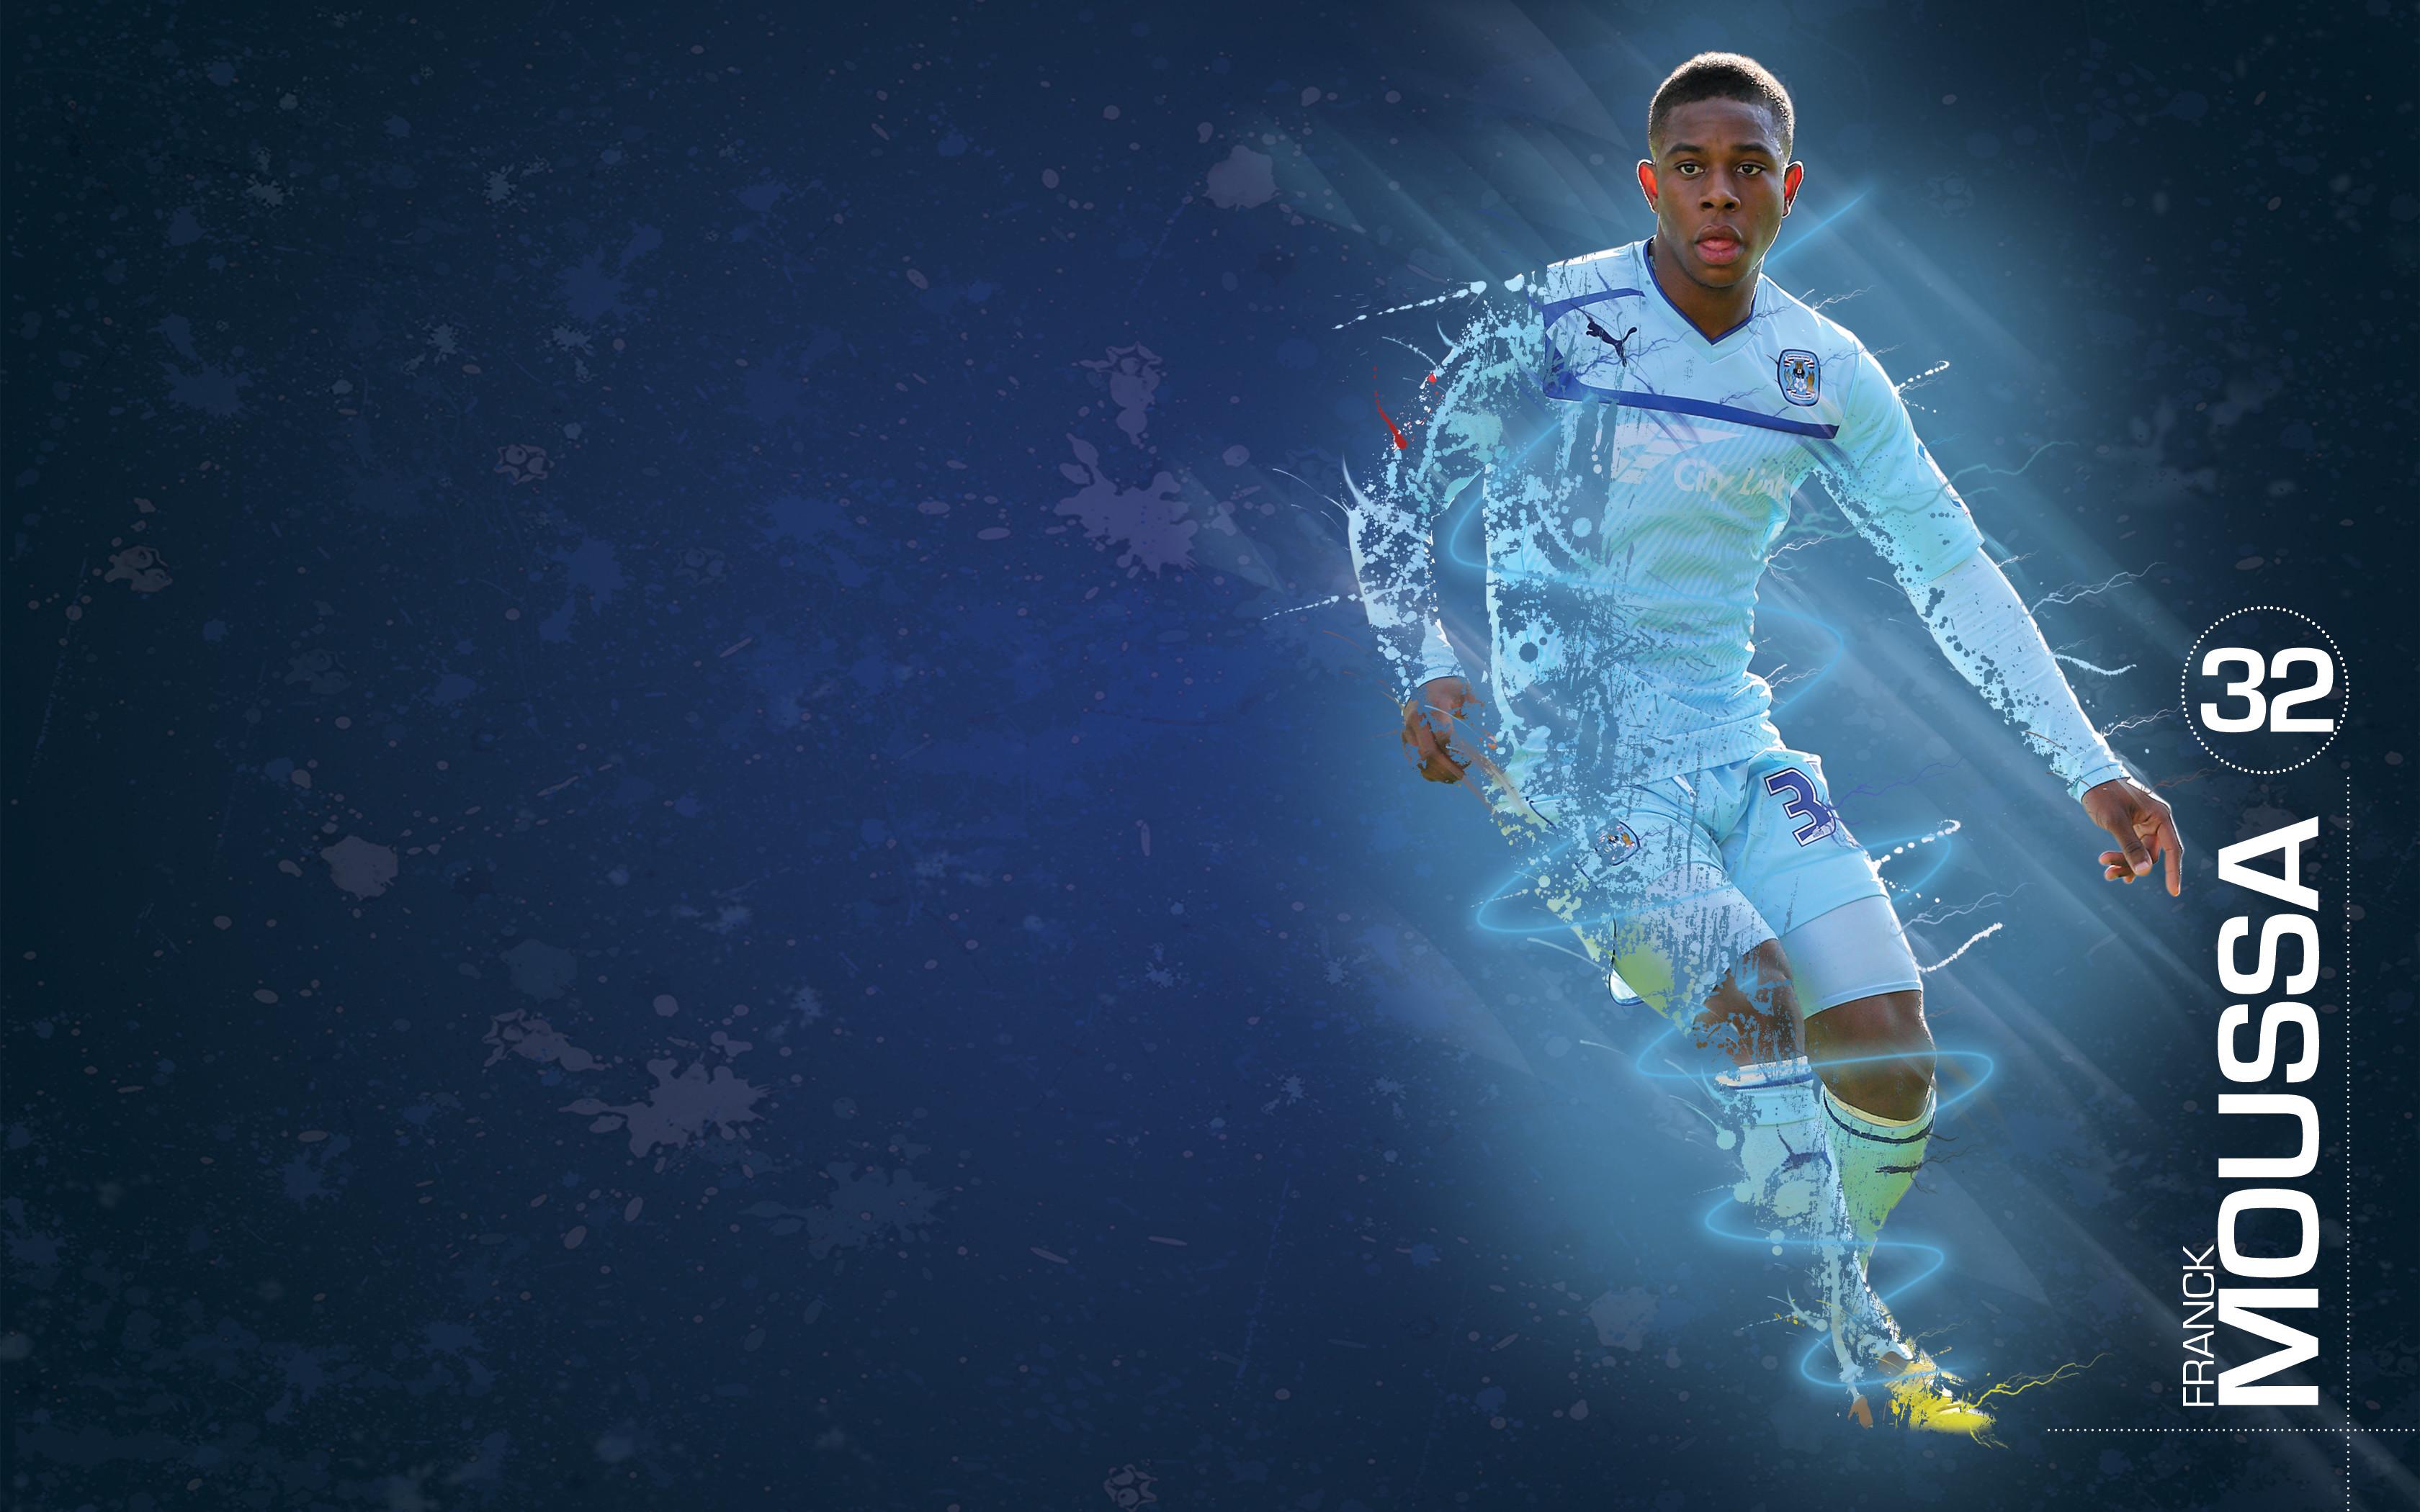 Tottenham Hotspur HD desktop wallpaper | Tottenham Hotspur wallpapers